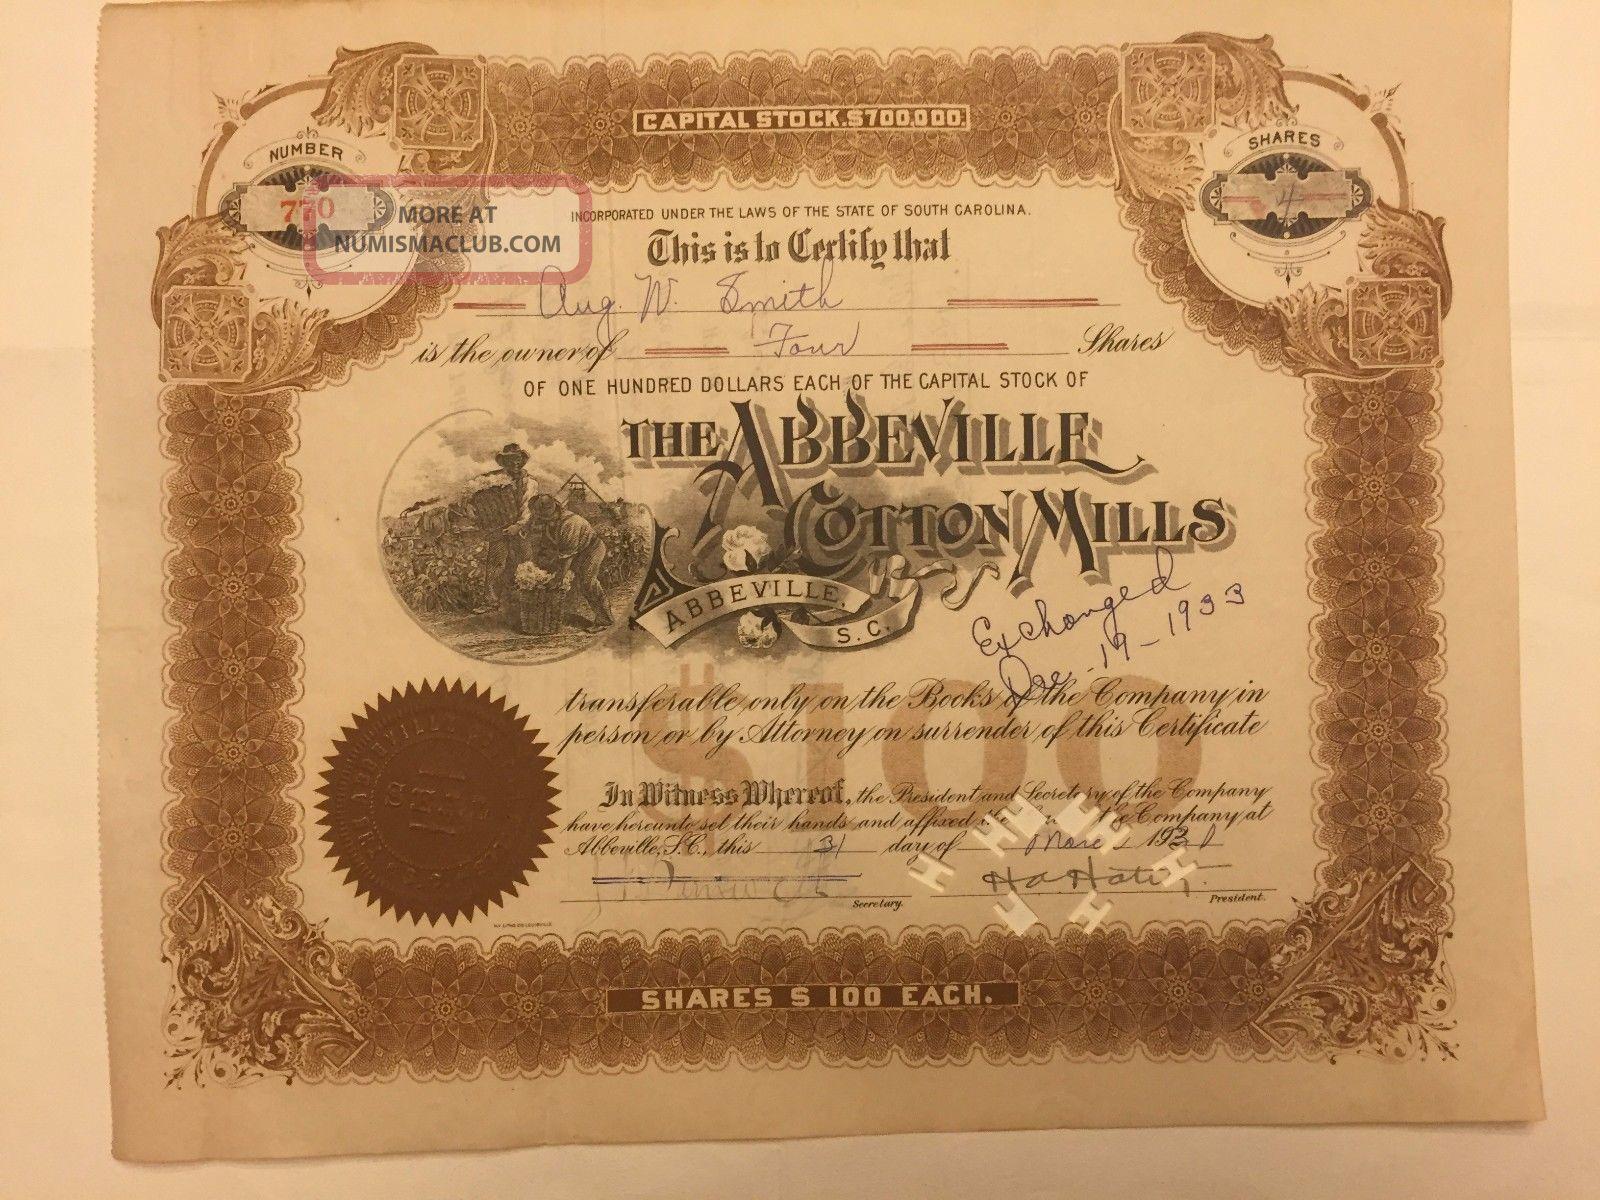 1931 Abbeville Cotton Mills Stock Certificate Rare South Carolina Slave Vignette Stocks & Bonds, Scripophily photo